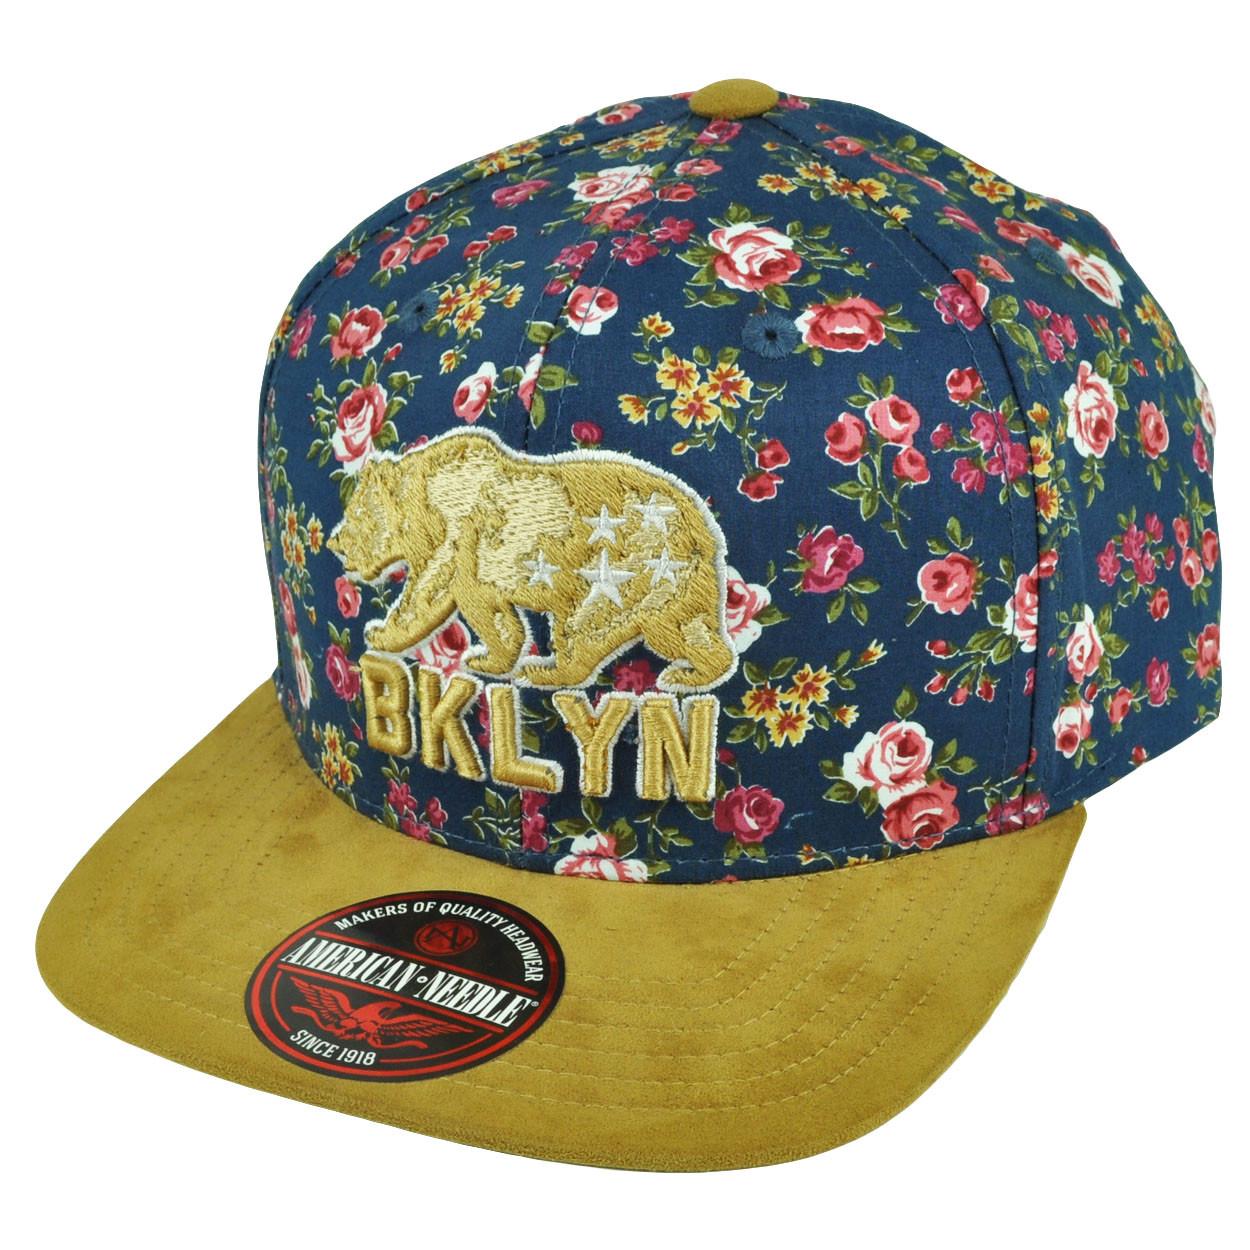 69f9a1ea974 American Needle Brooklyn Flat Bill Strap Back Hat Cap Floral Pattern ...